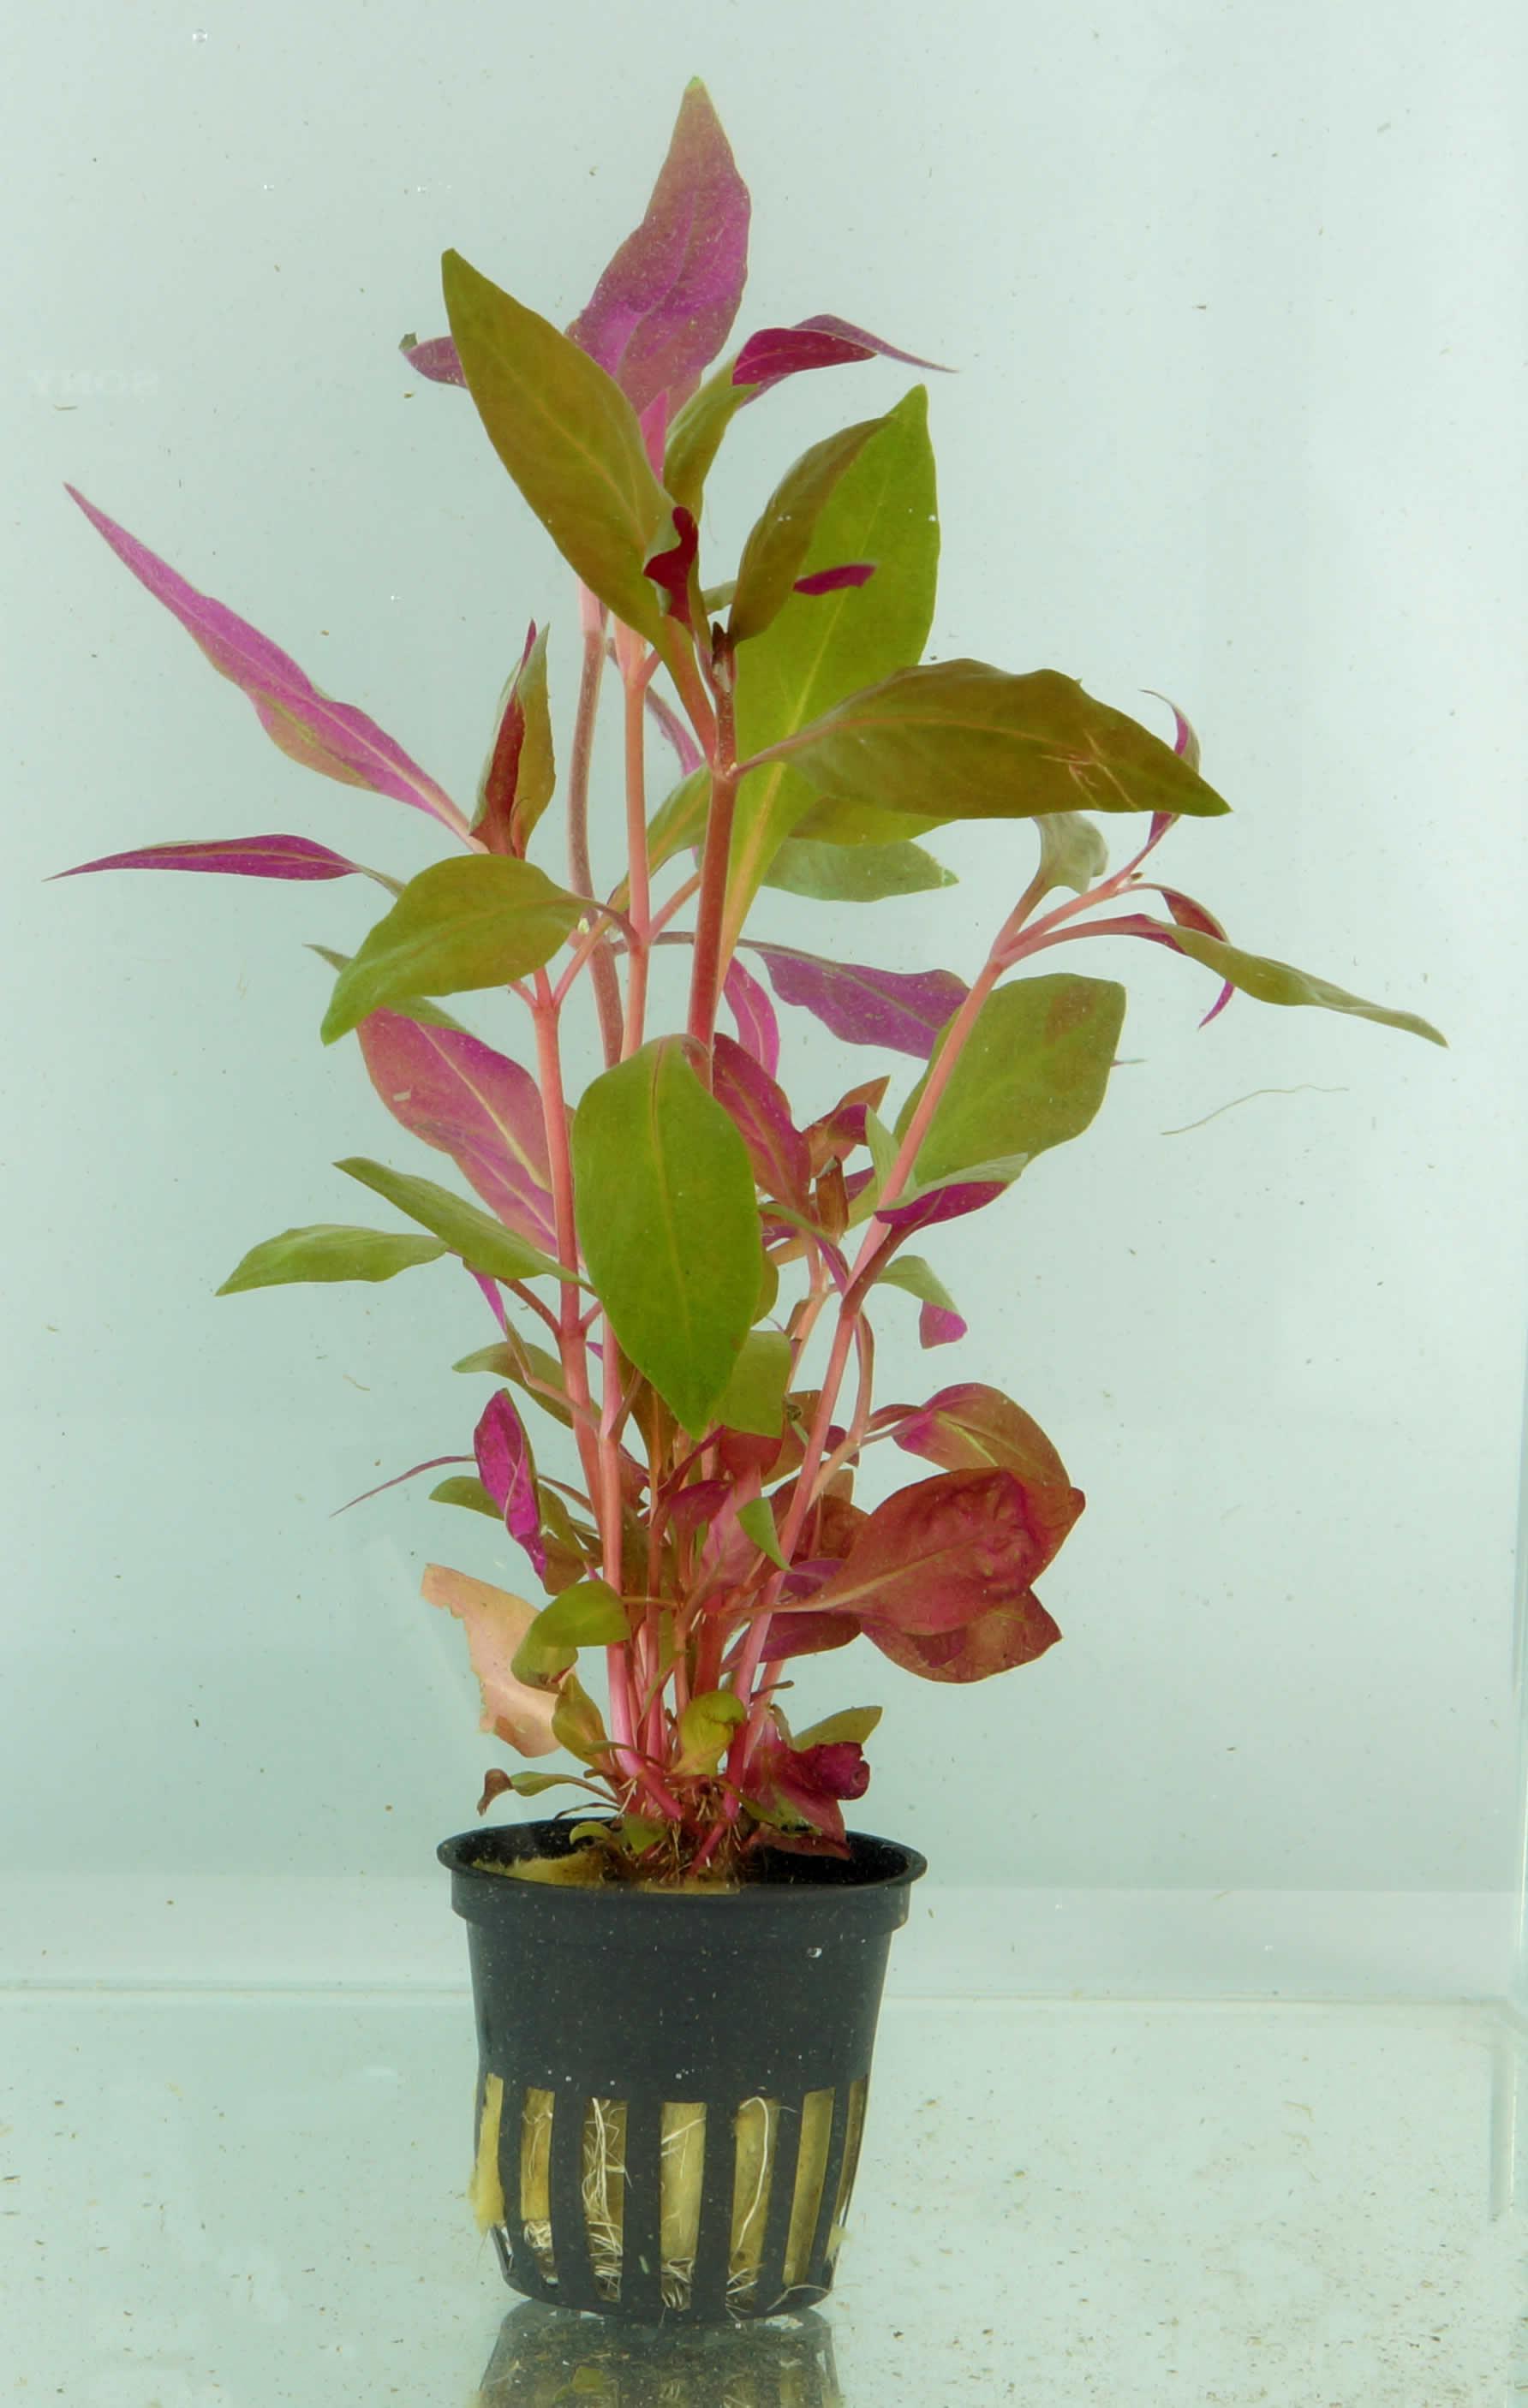 Alternanthera cardinalis - breitbl�ttriges Papageienblatt - 5 cm Topf